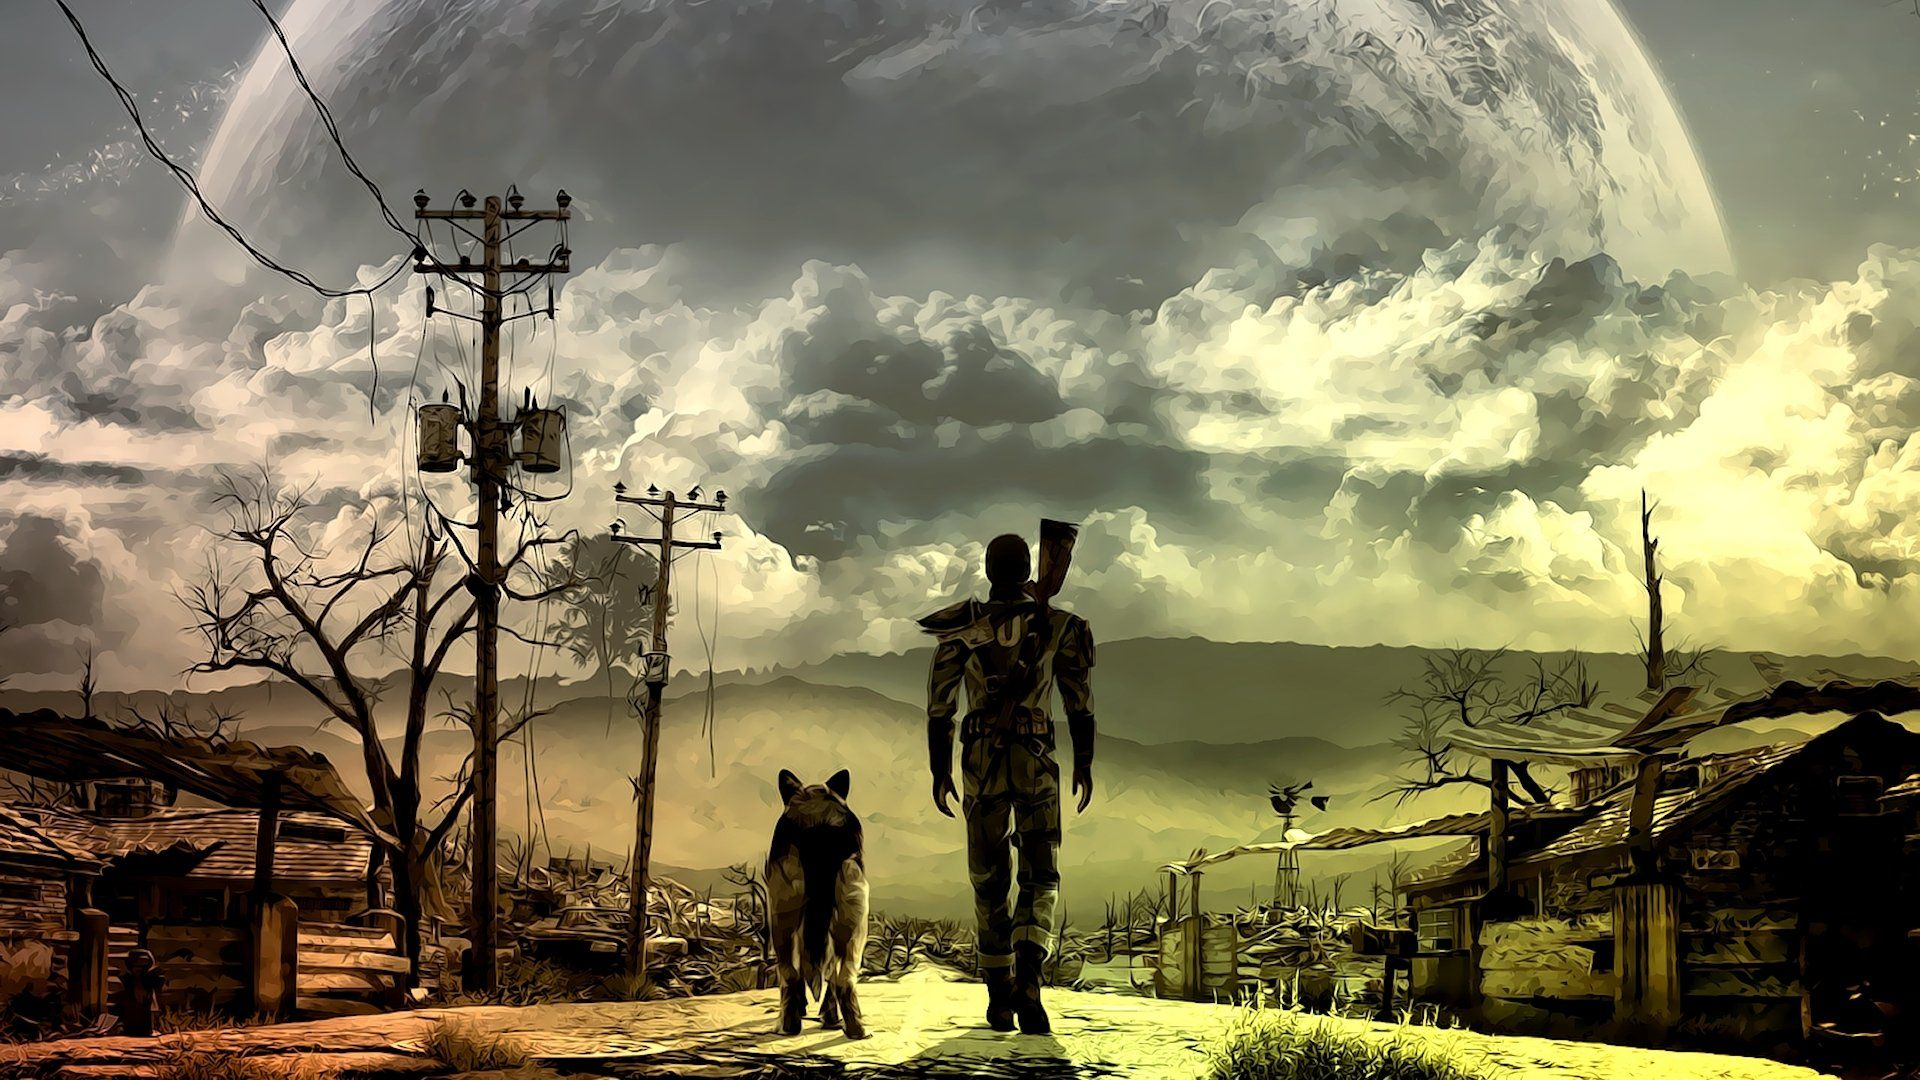 Video Game Fallout 3 Fallout Wallpaper Fallout Wallpaper Fallout 4 Wallpapers Fallout Backgrounds